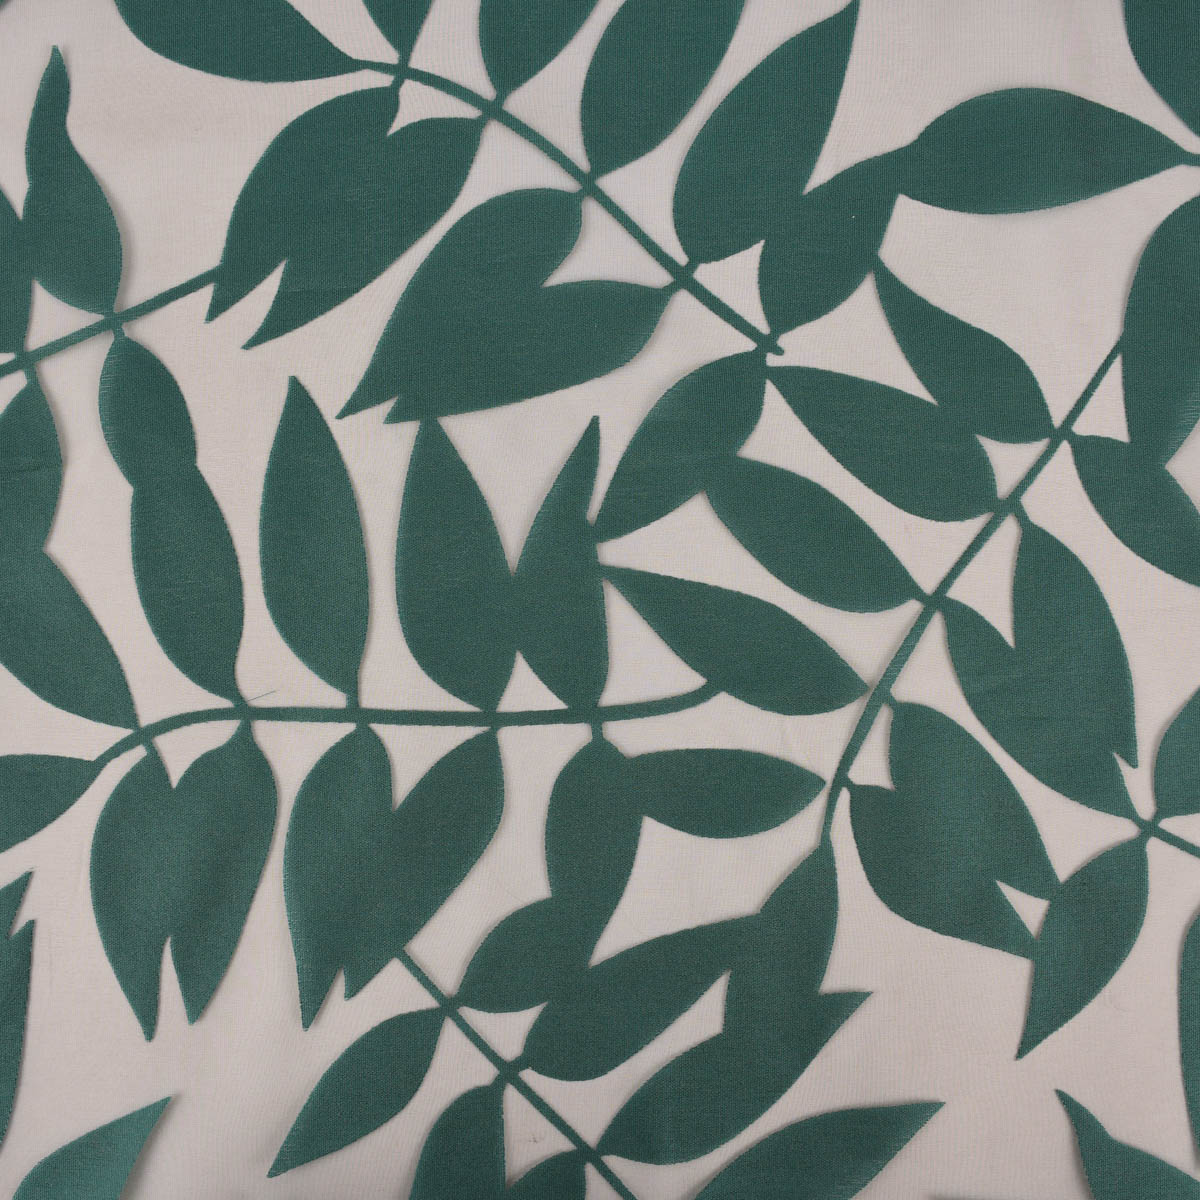 Rasch Textil Gardinenstoff Stores Ausbrenner Sri Lanka Blätter petrol bronze 300cm